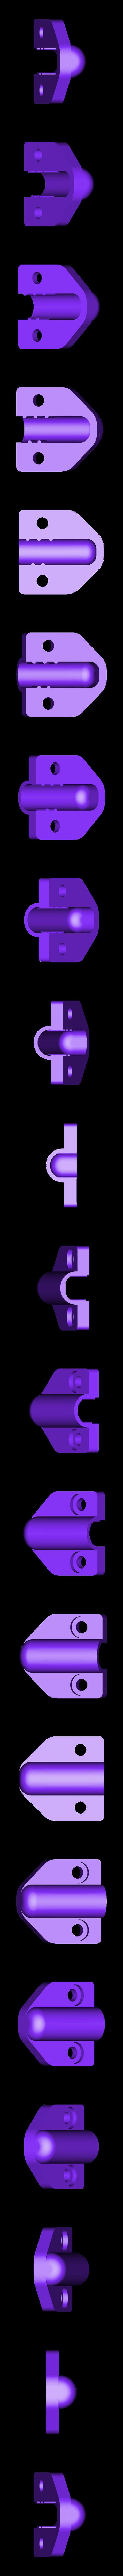 Flexible.stl Download free STL file Flexible - cable grommet • 3D printable object, Boxplyer